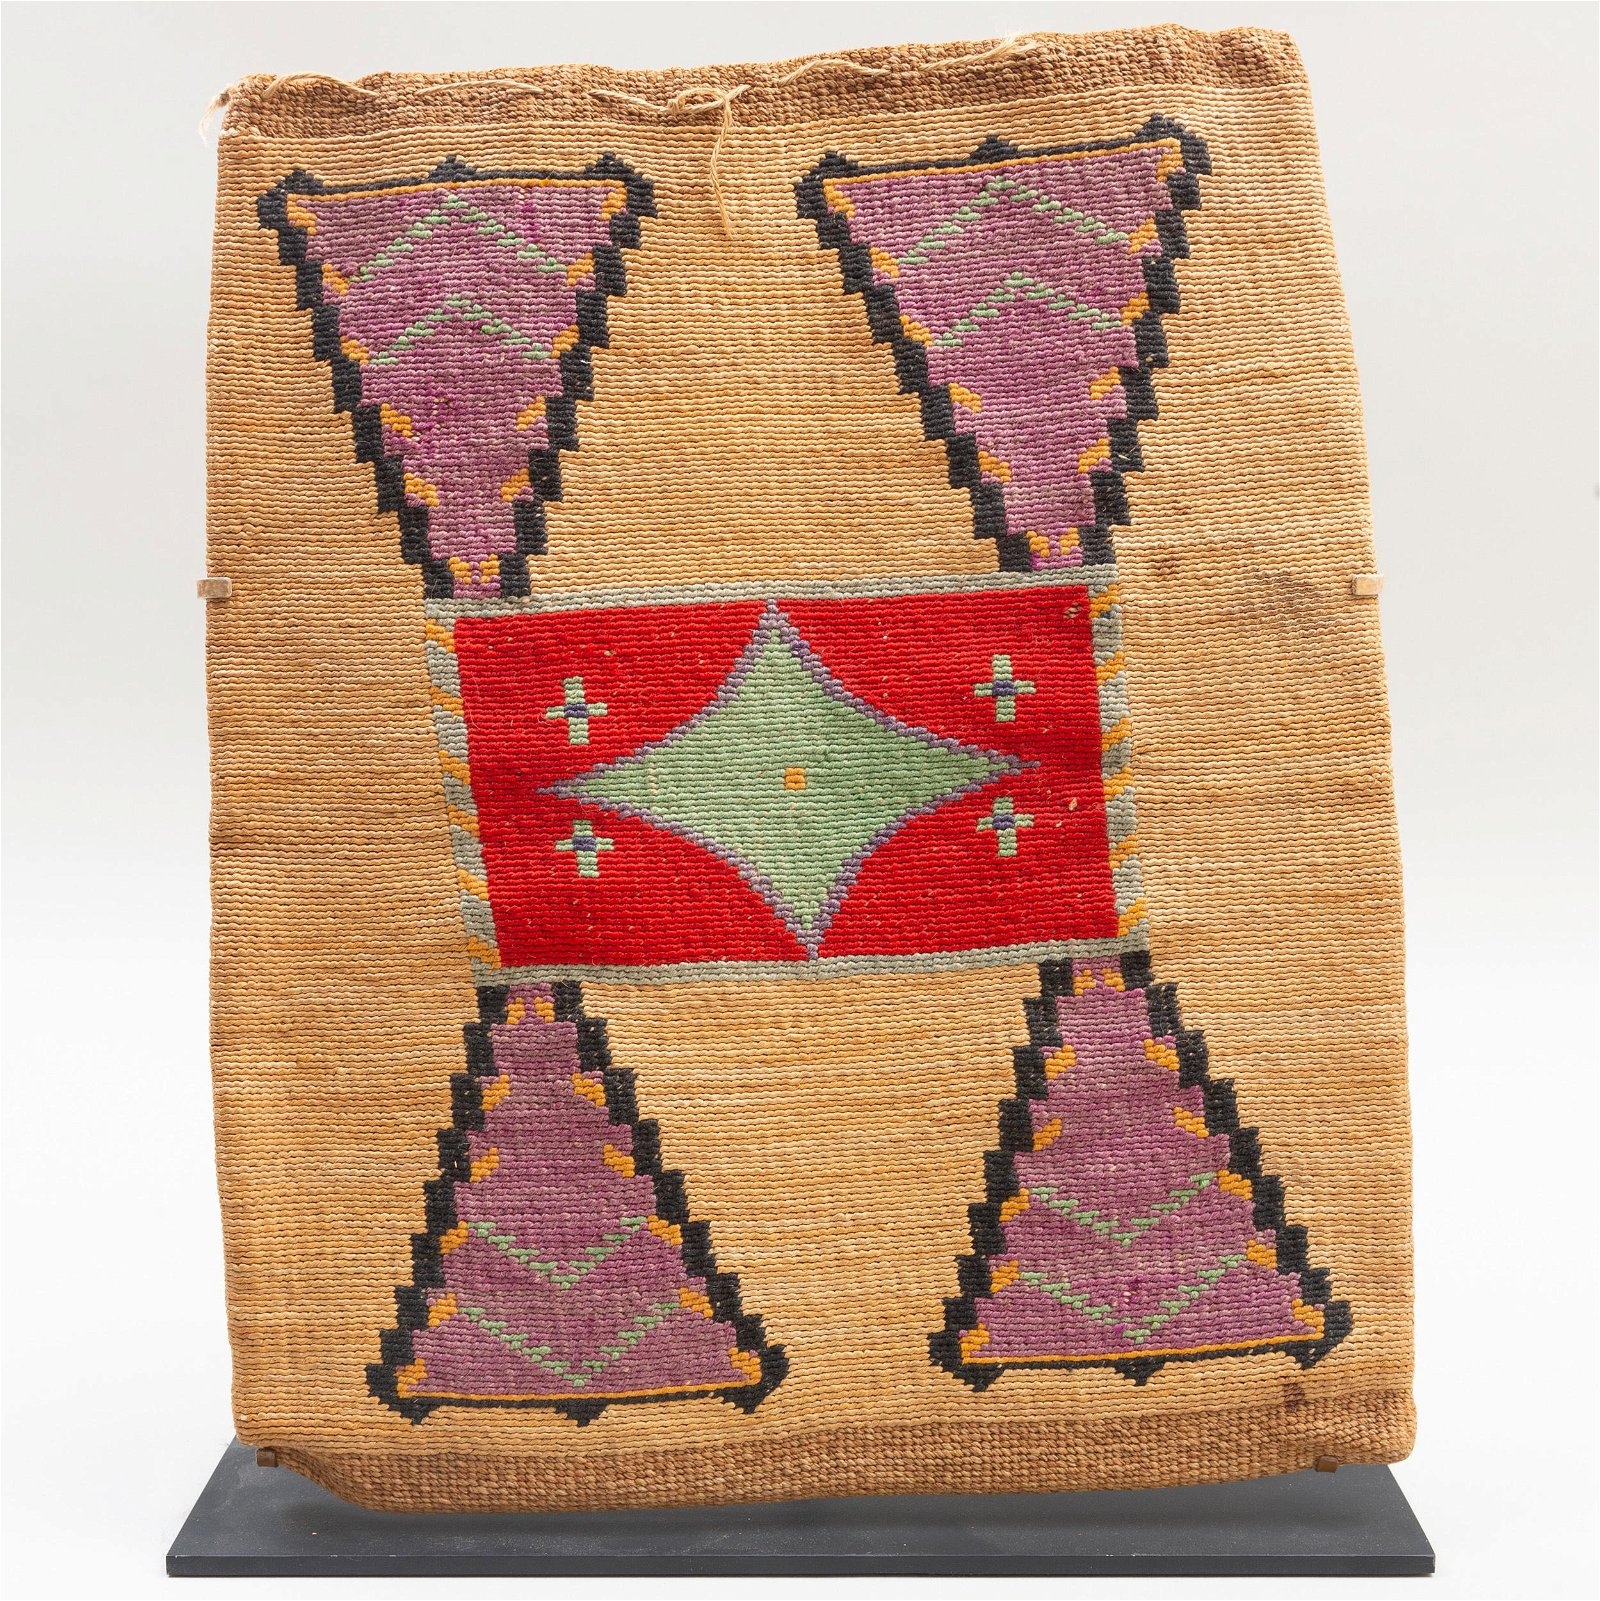 Nez Perce Woven Cornhusk Fibers and Wool Bag